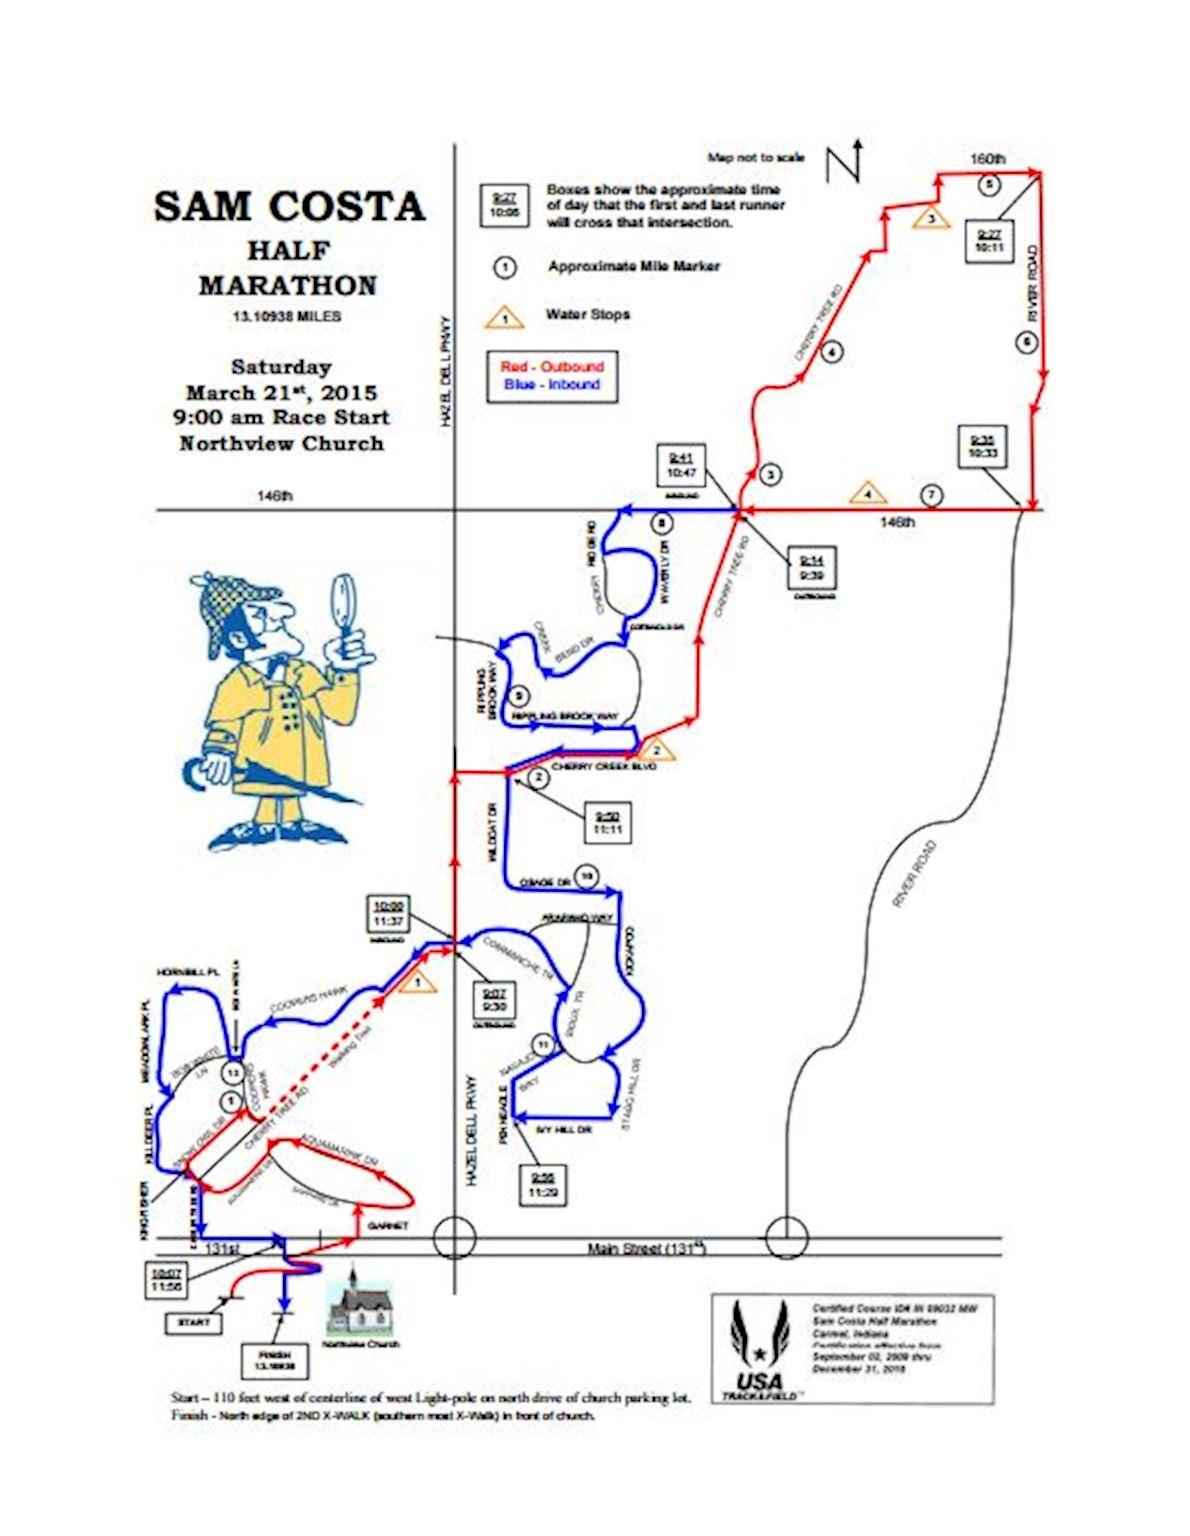 Sam Costa Half Marathon Routenkarte